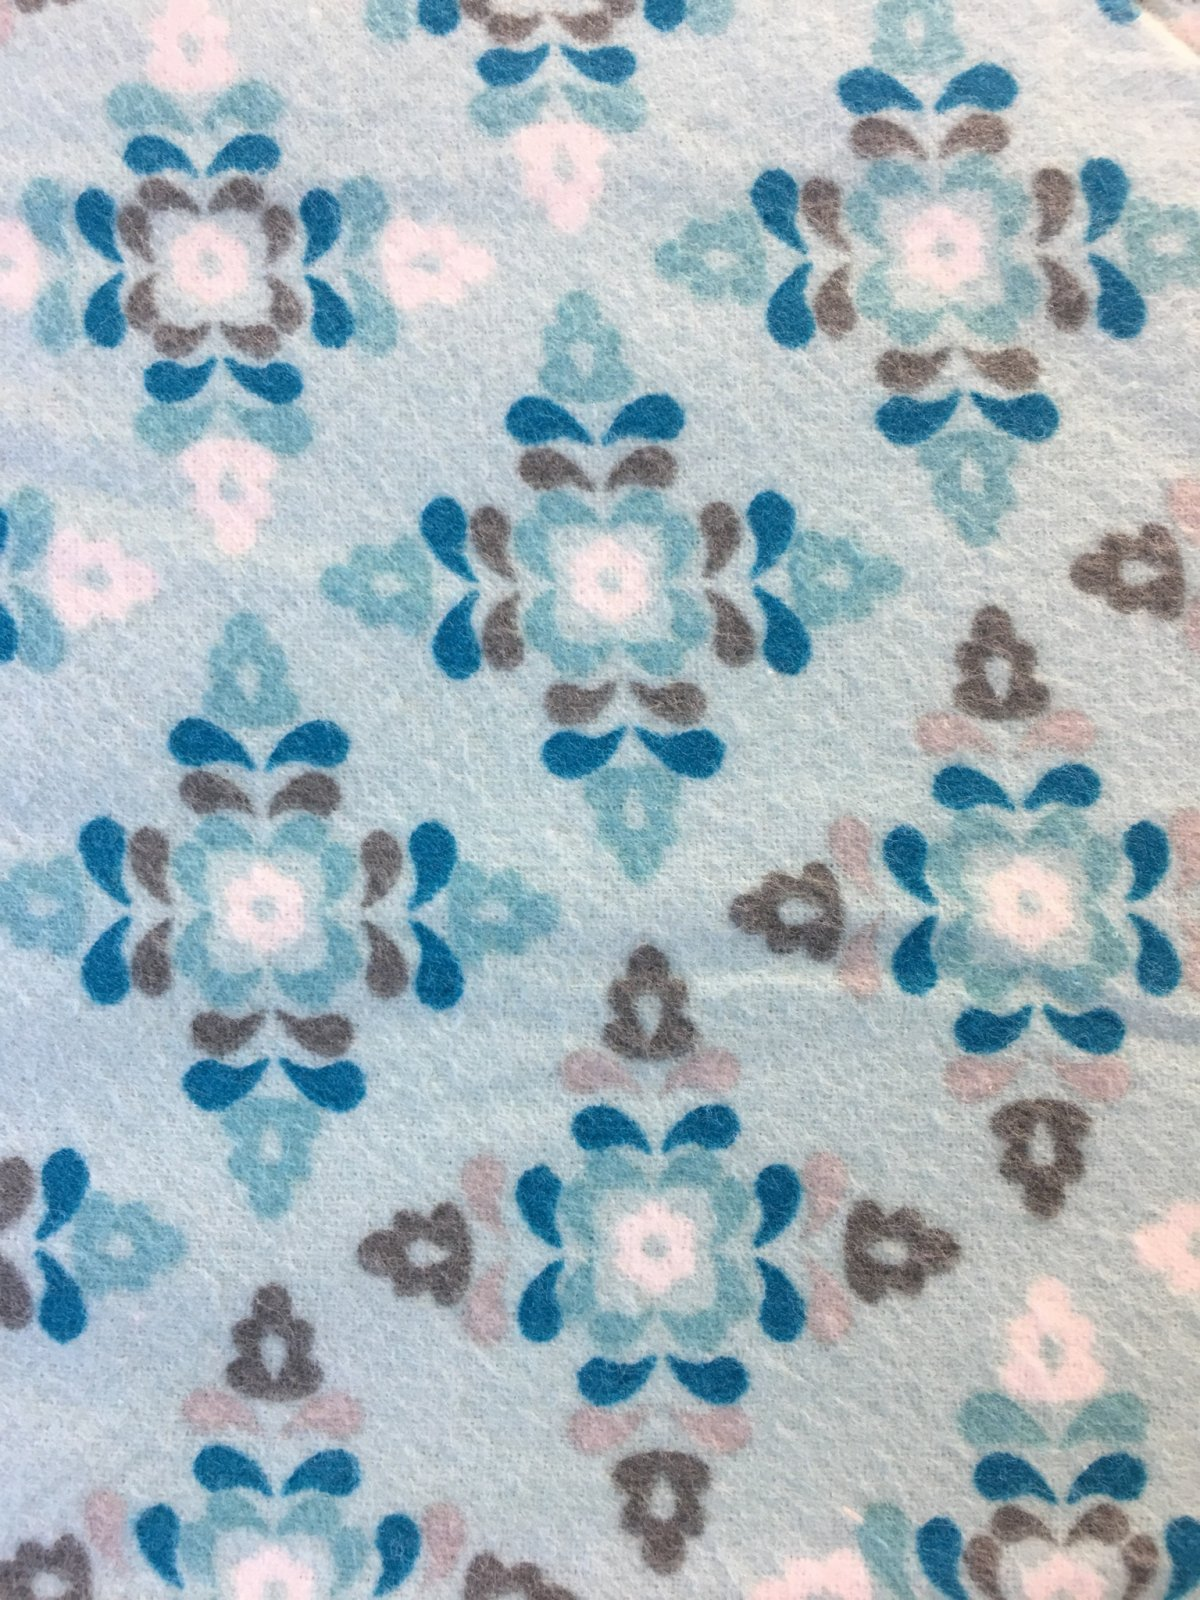 Winter Warmth-Designs - Diamond & Snowflakes on Light Blue